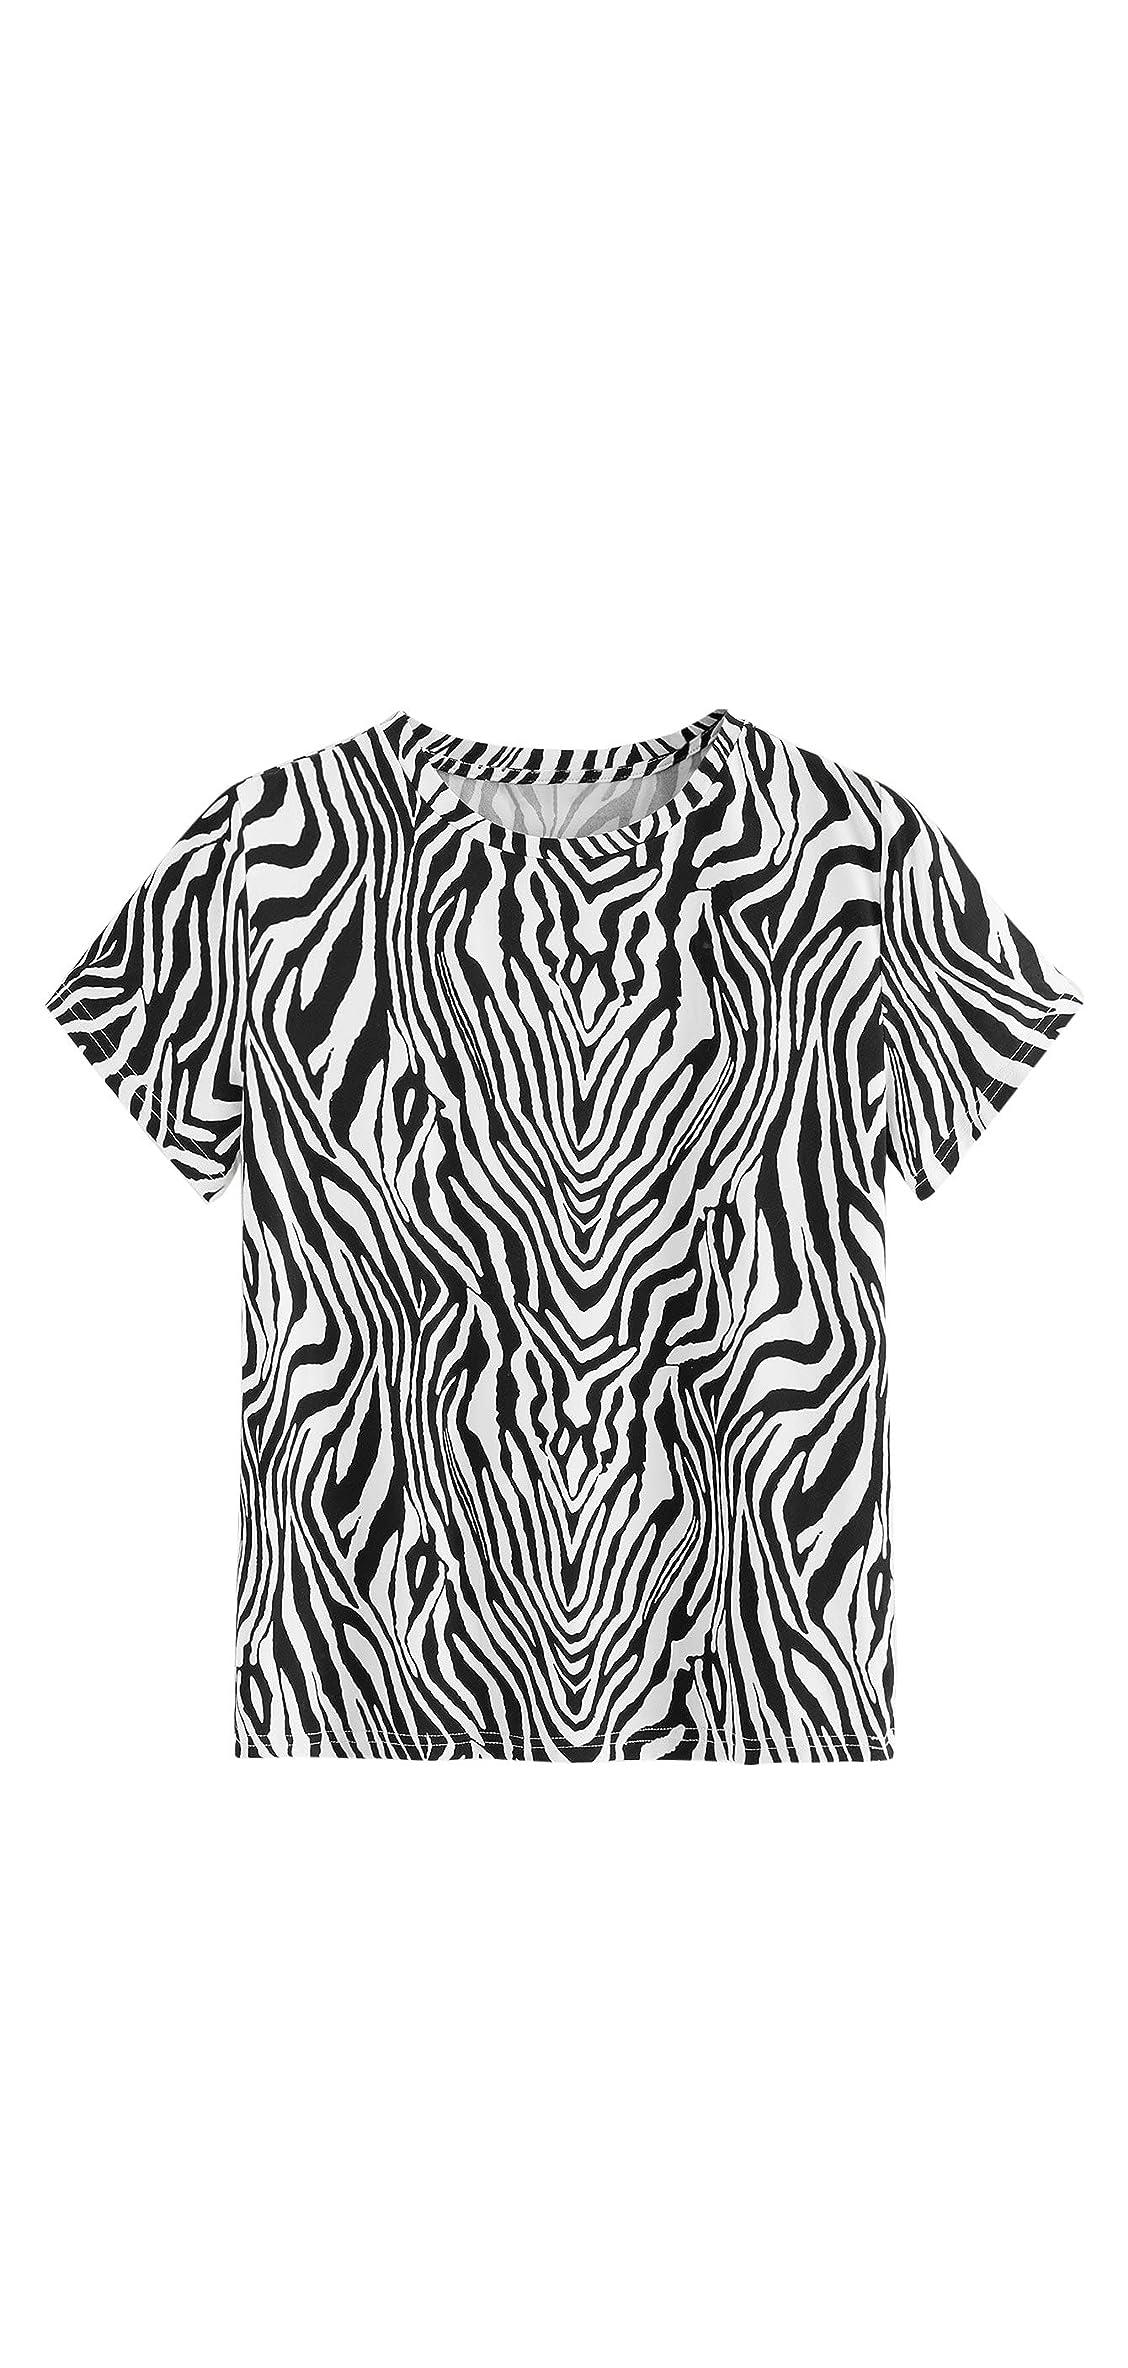 Women's Casual Leopard Print Round Neck Short Sleeve T